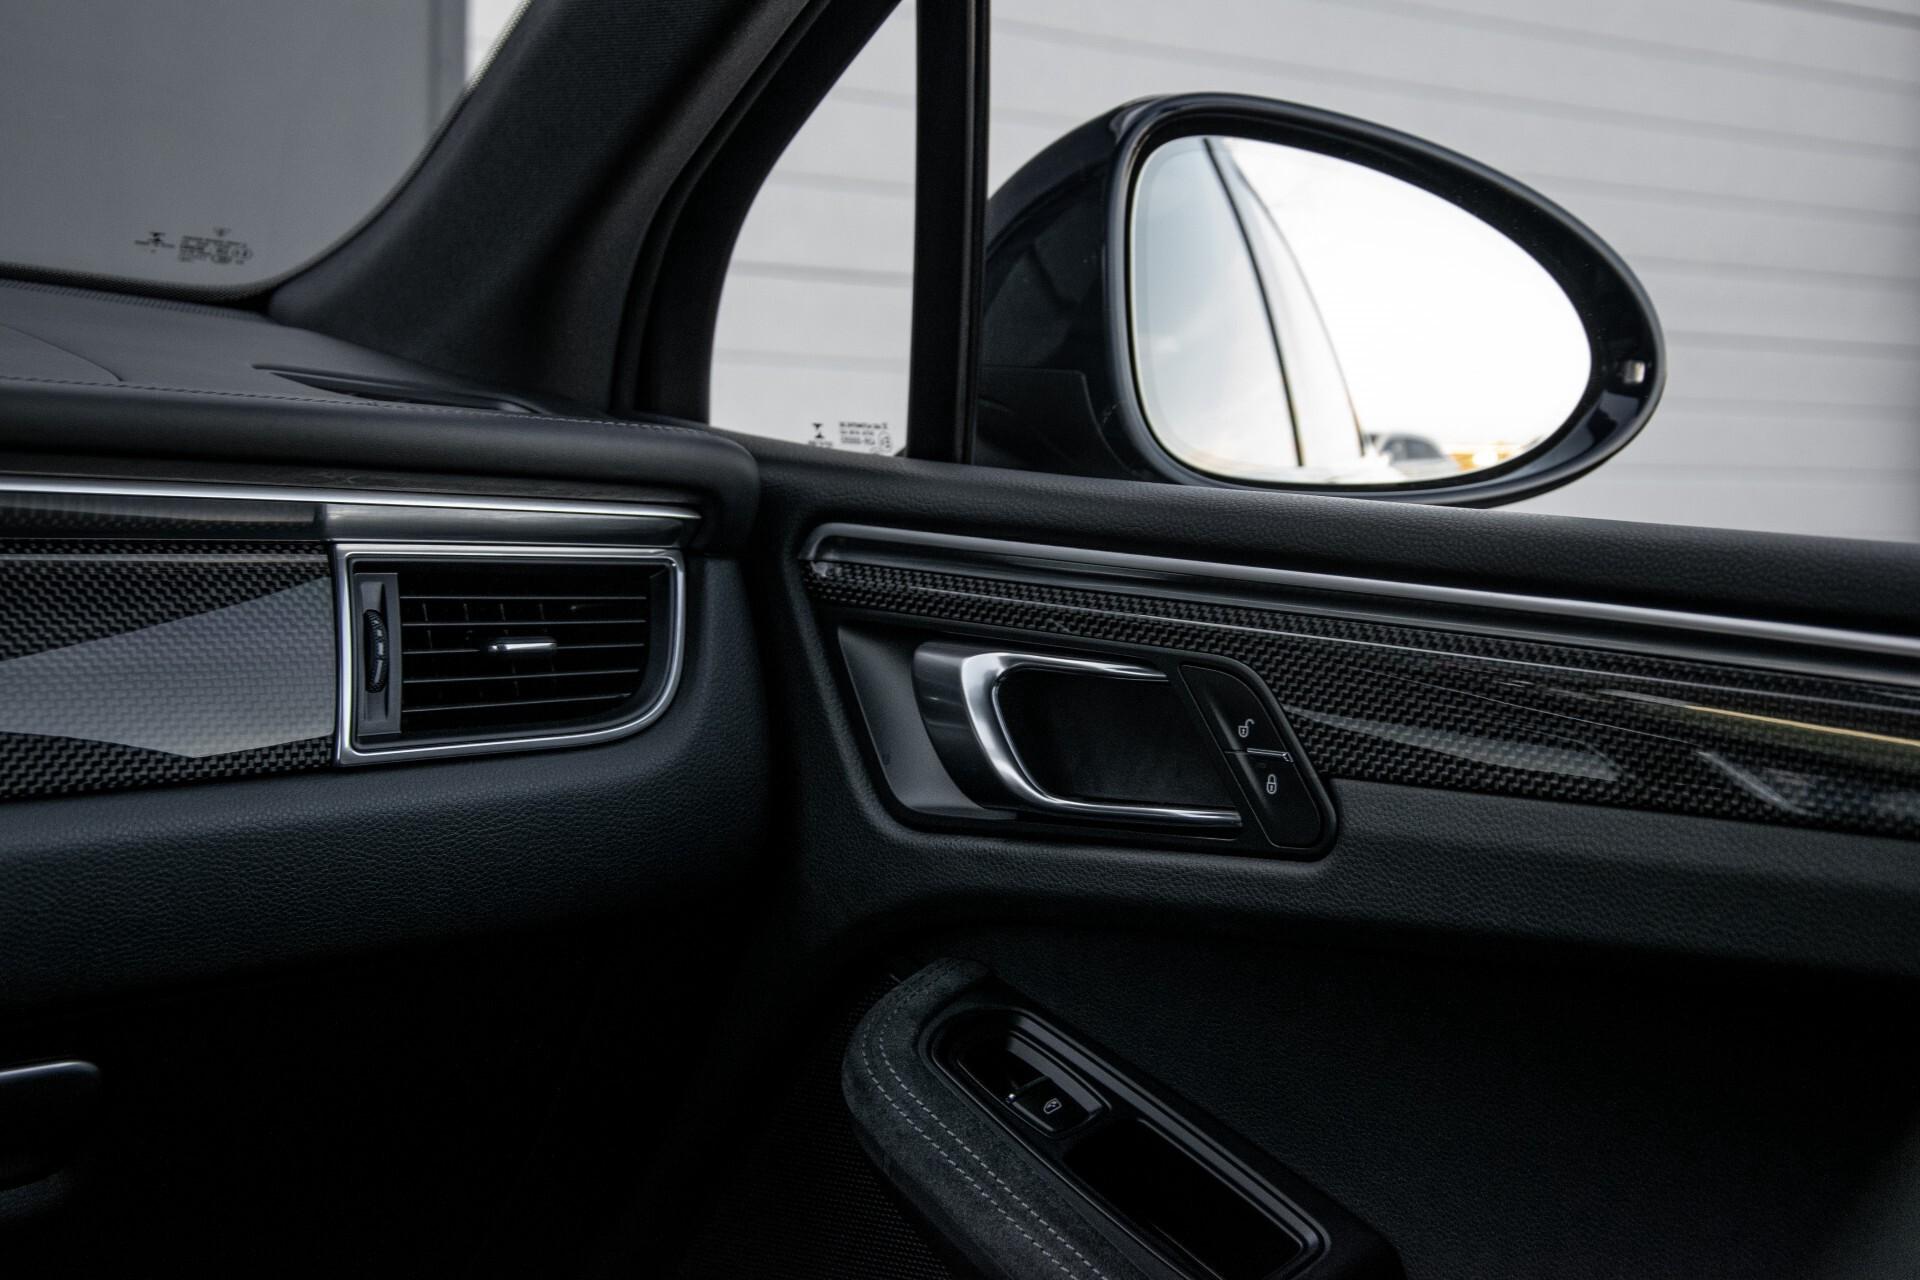 Porsche Macan 3.0 GTS Luchtvering/Panorama/Carbon/Bose/360-camera/Memory/PDLS Aut7 Foto 41